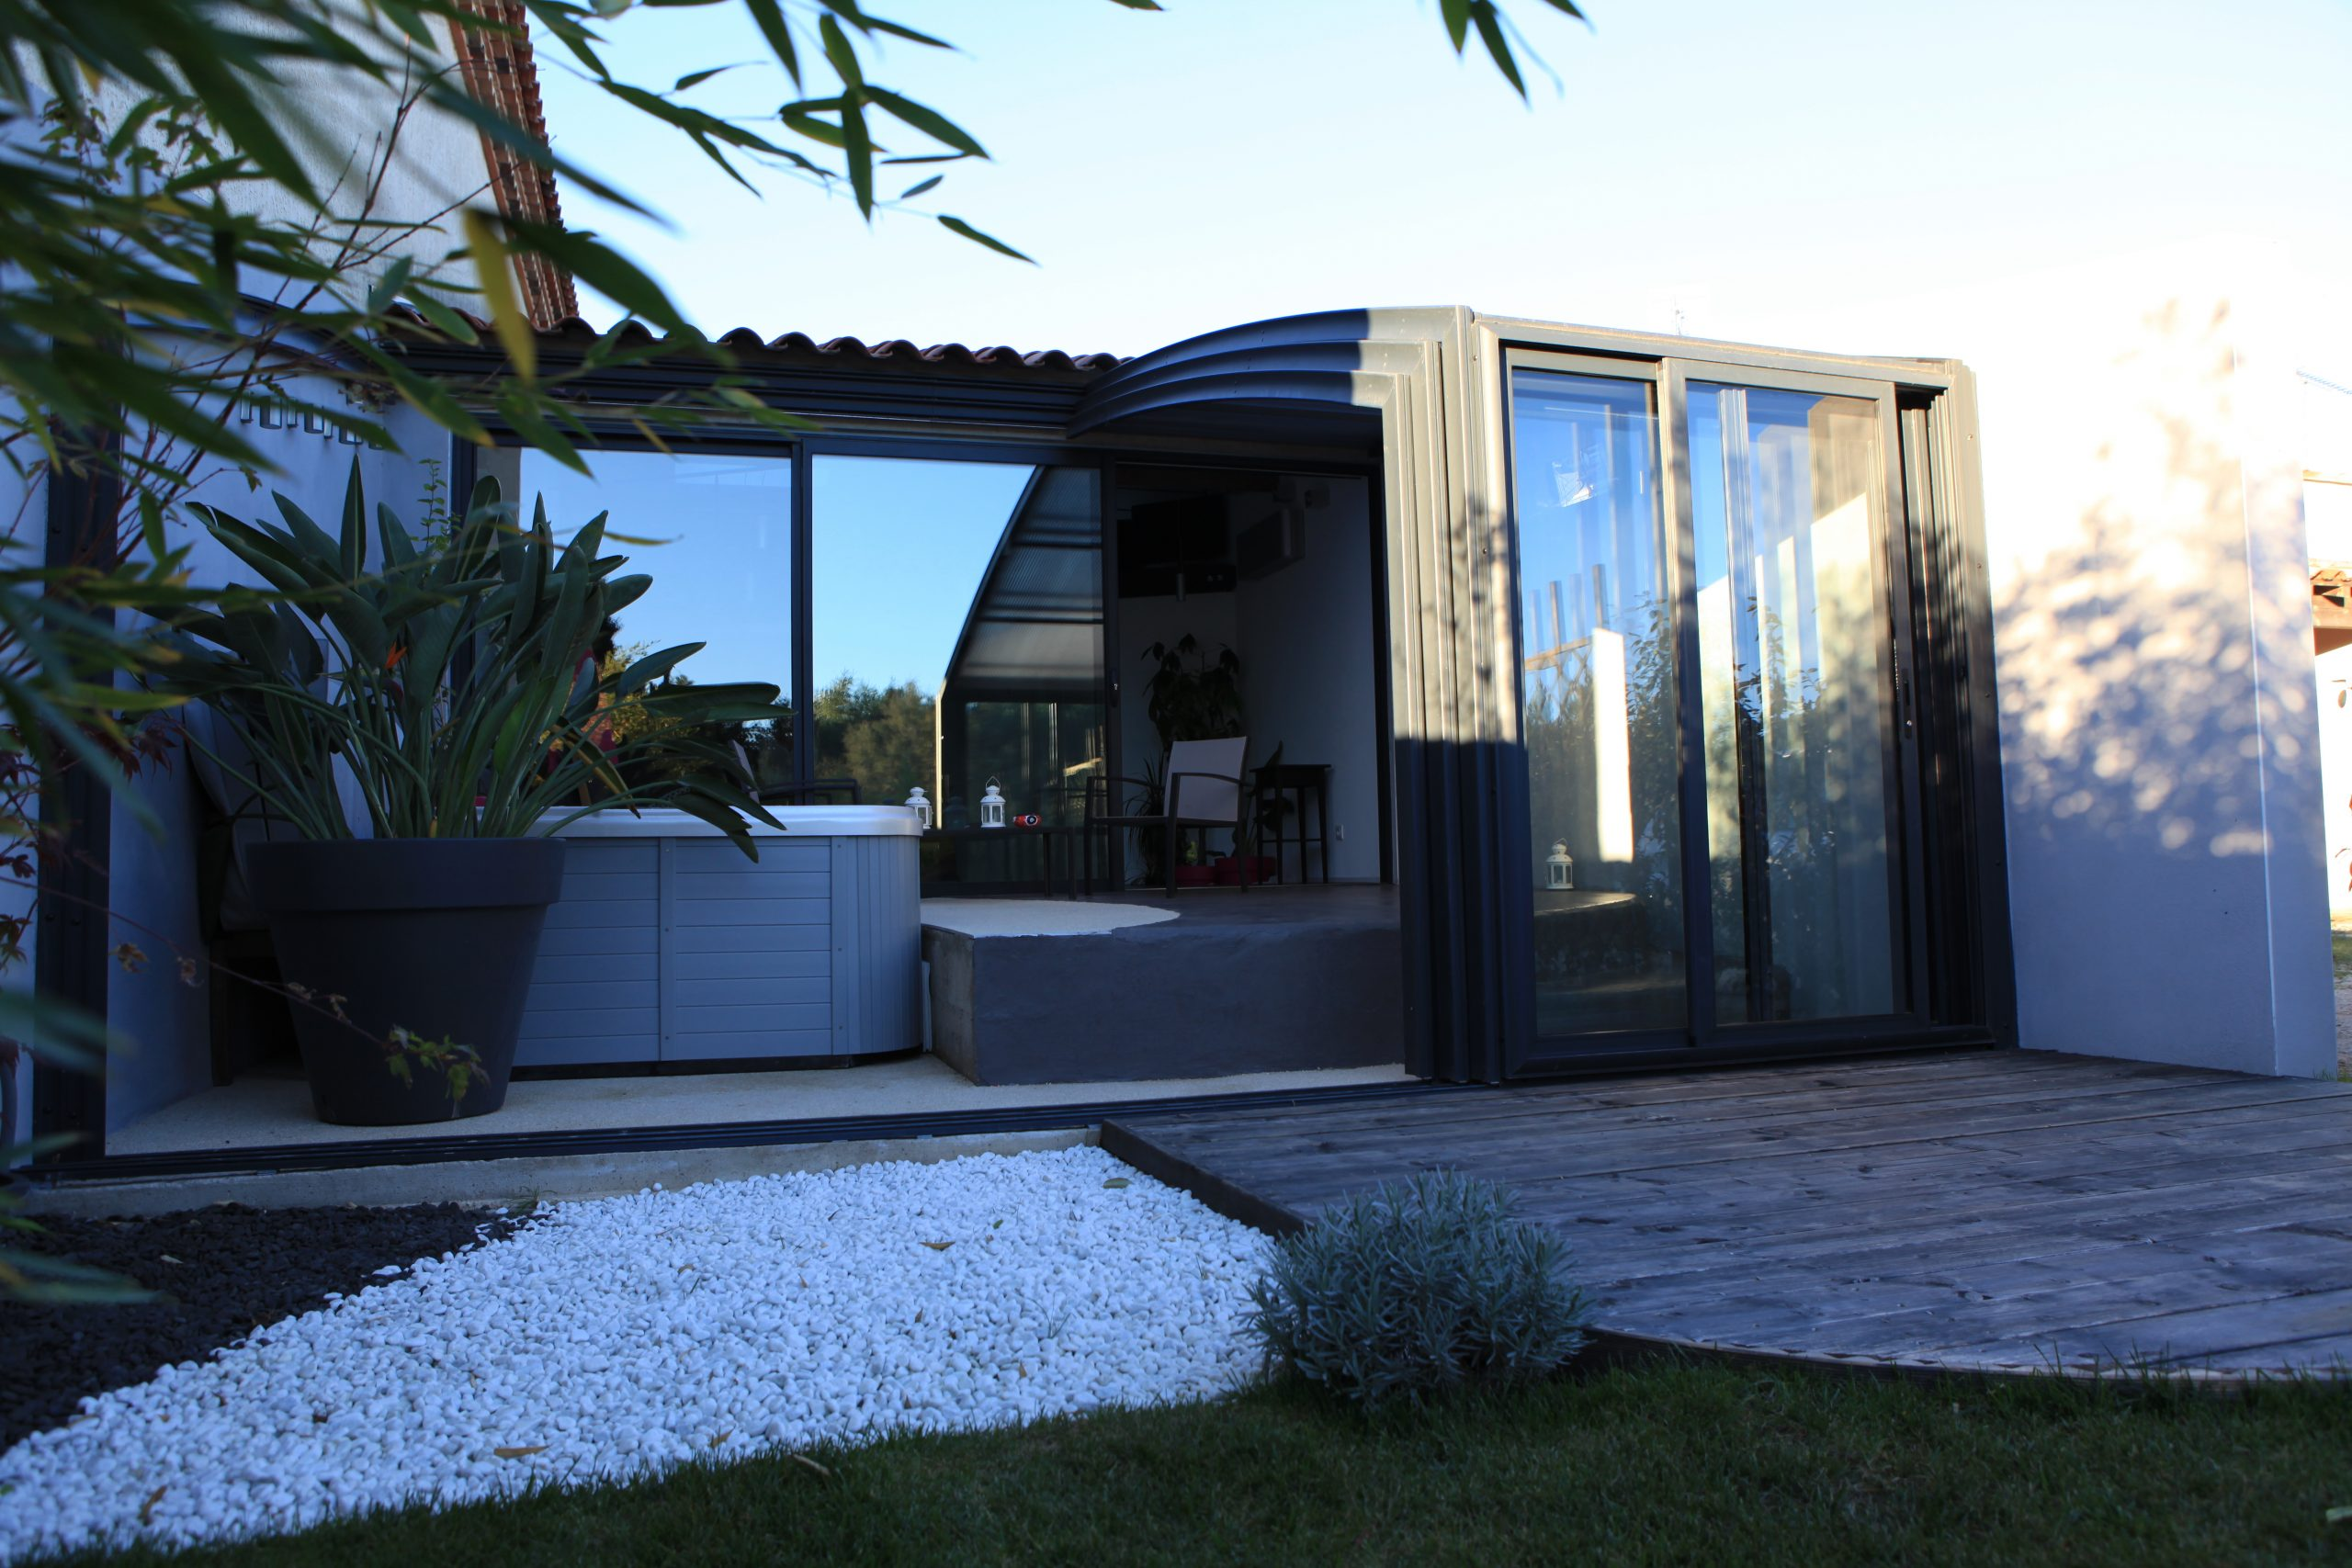 Abri Terrasse Fixe Et Coulissant | Fabricant Azenco serapportantà Abri De Terrasse Coulissant